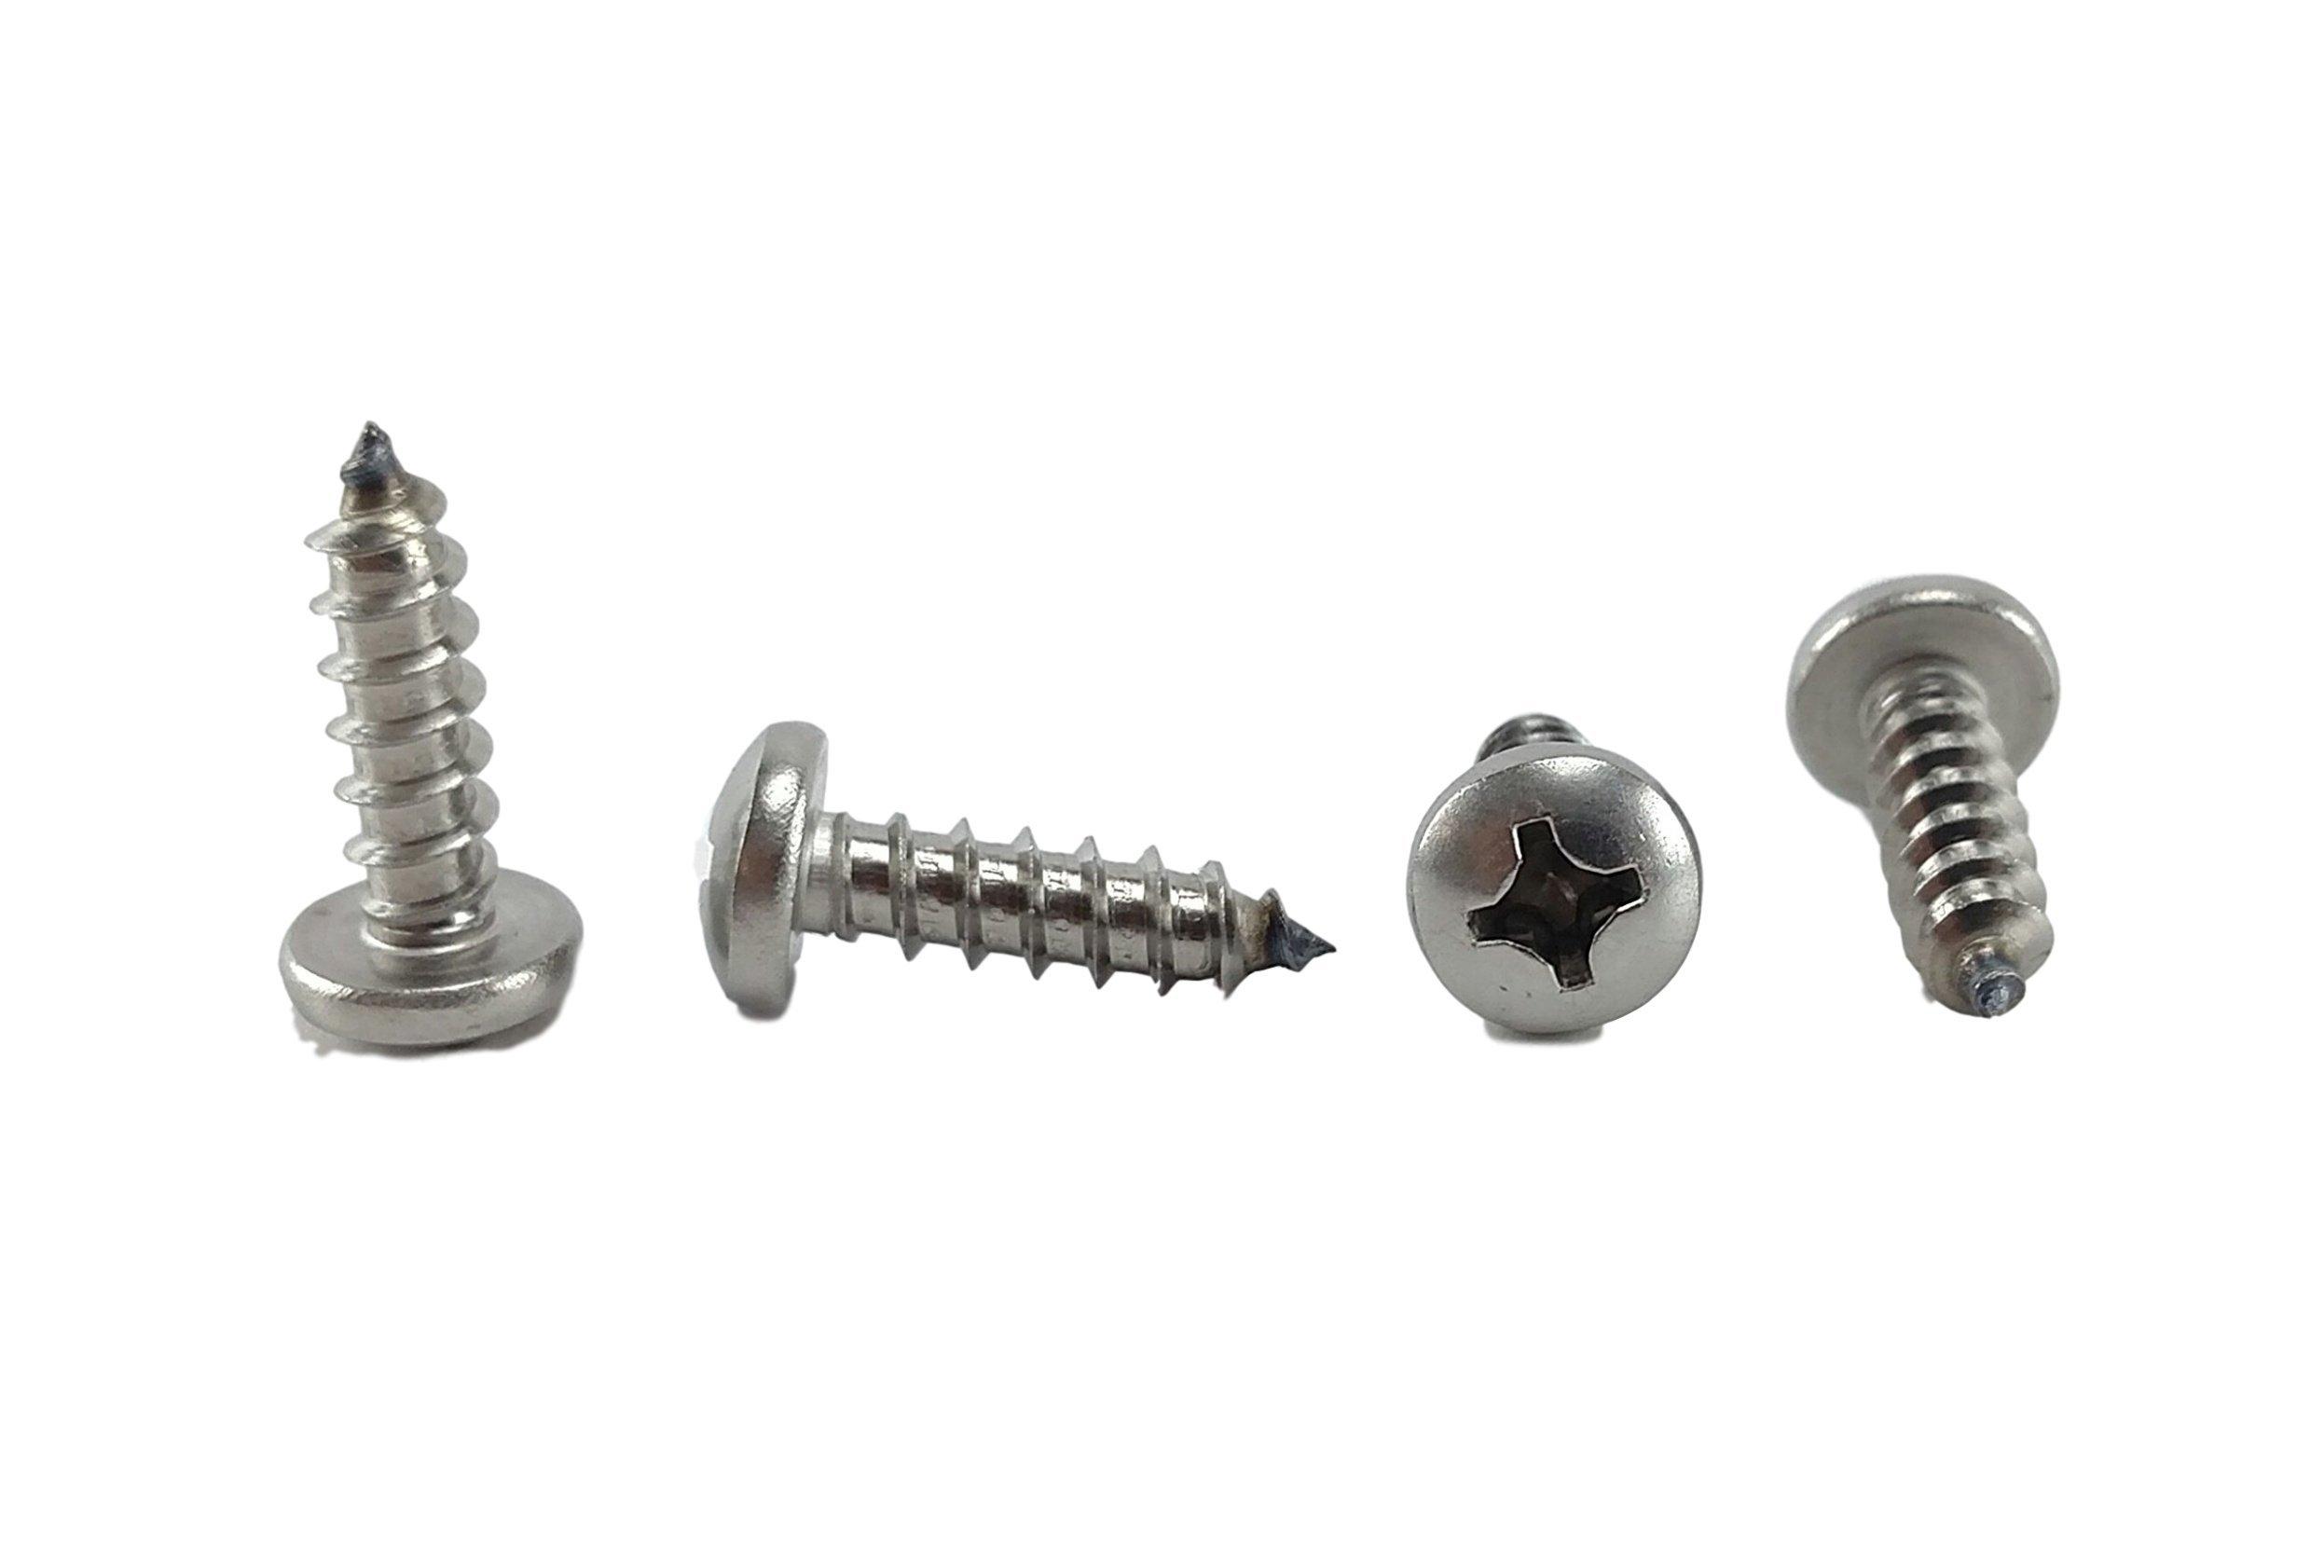 #12 X 3/4 Stainless 18-8 Phillips Pan Head Sheetmetal Screw (1/2'' to 2-1/2'' in Listing) 100 Sheet Metal Screws (#12 X 3/4 INCH)